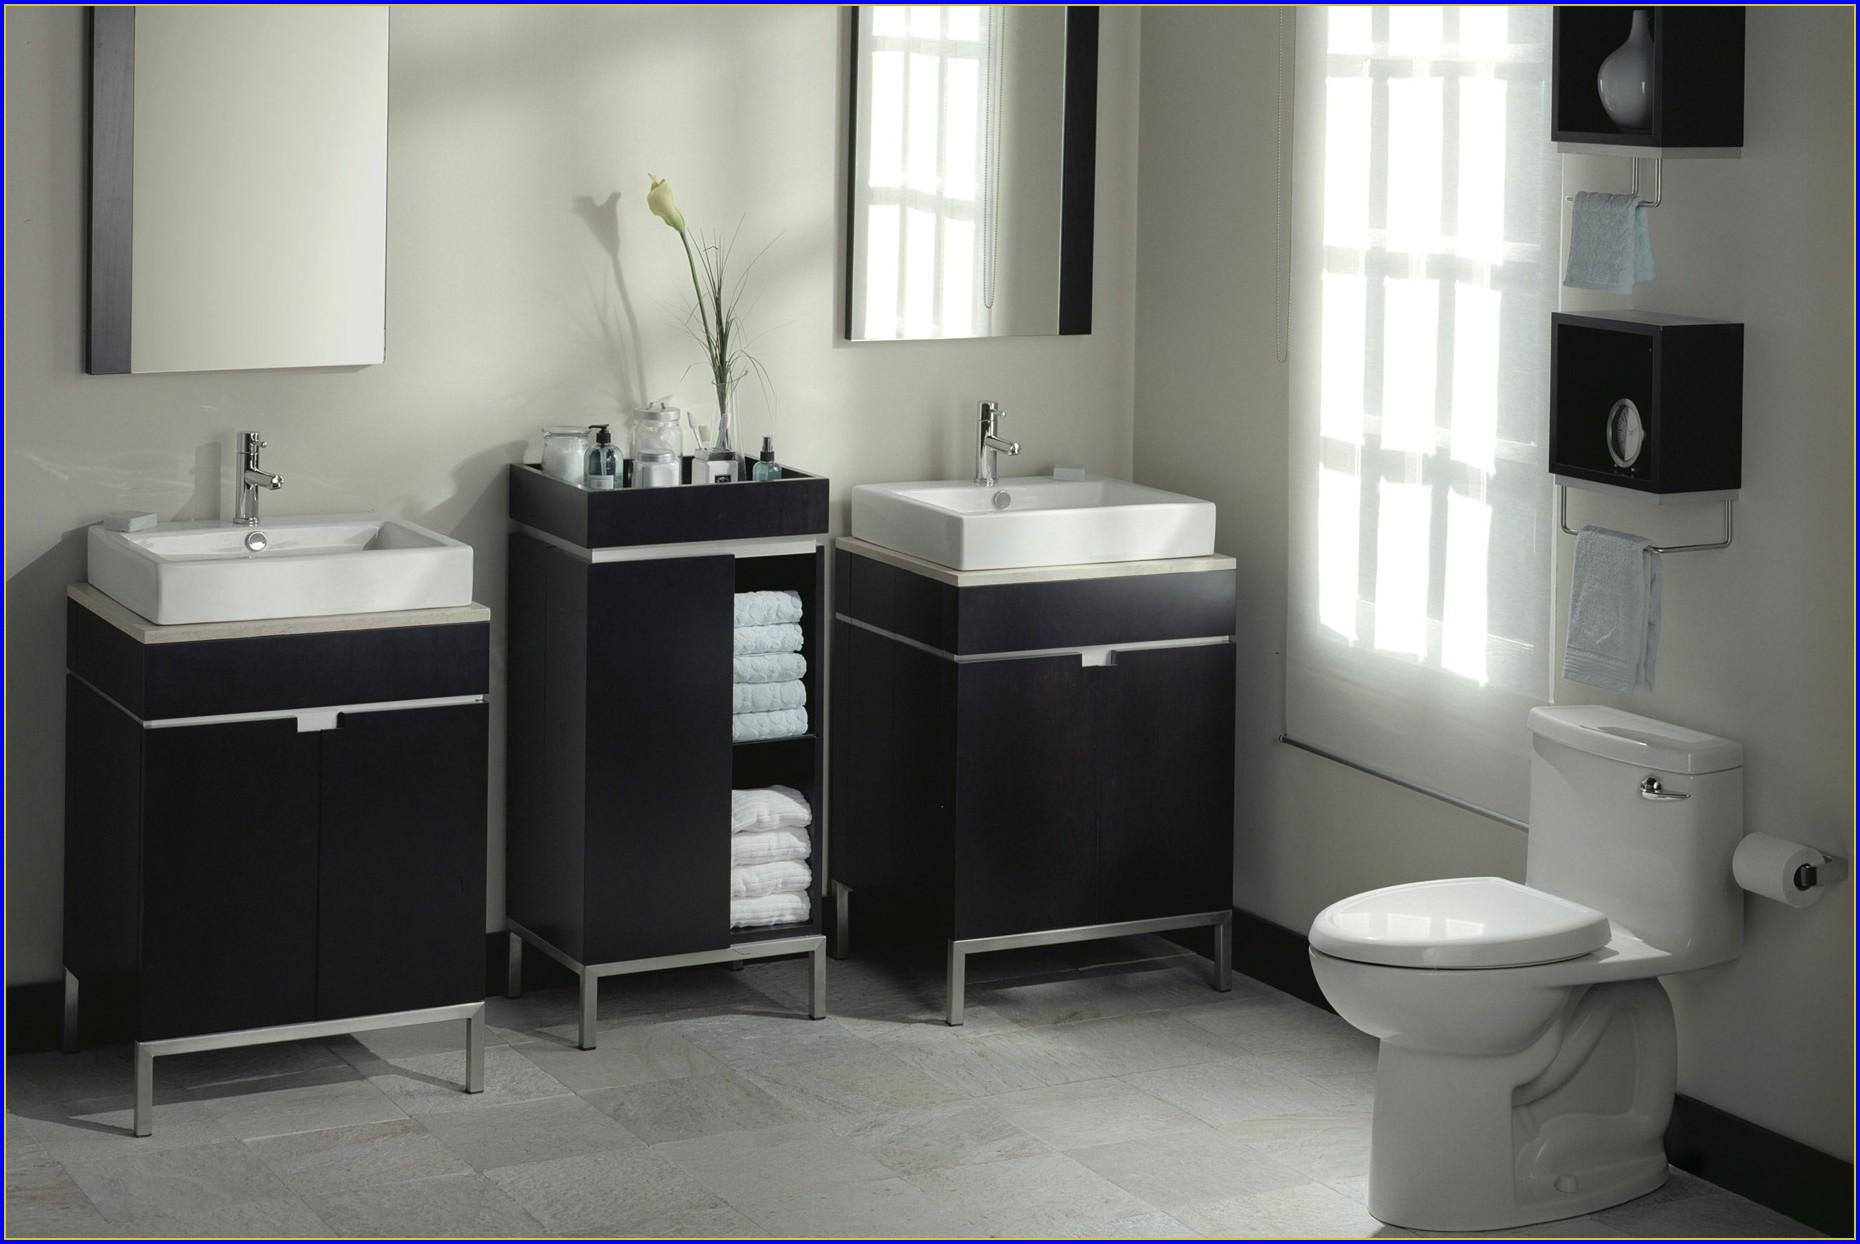 American Standard Bathroom Sink Faucet Repair